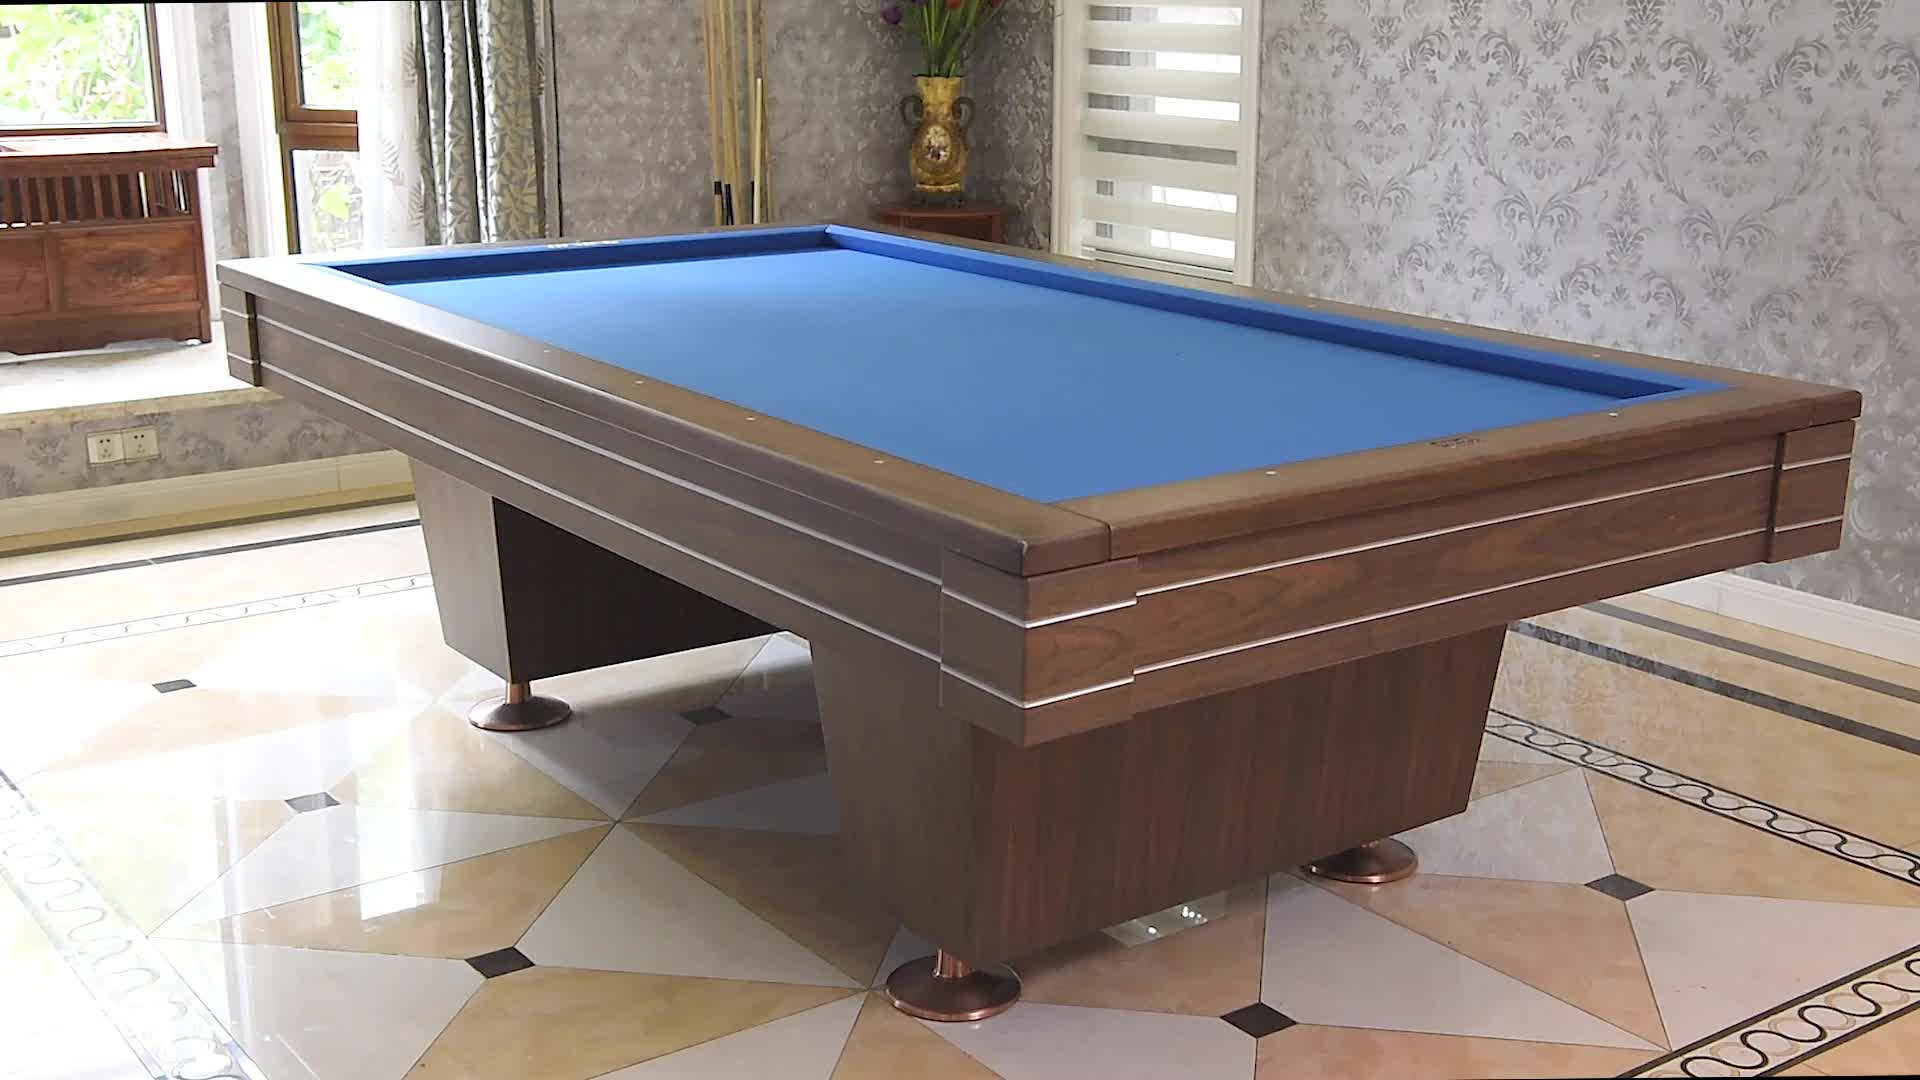 3 подушки корейский стиль carom Бильярд 8 мяч бильярдный стол